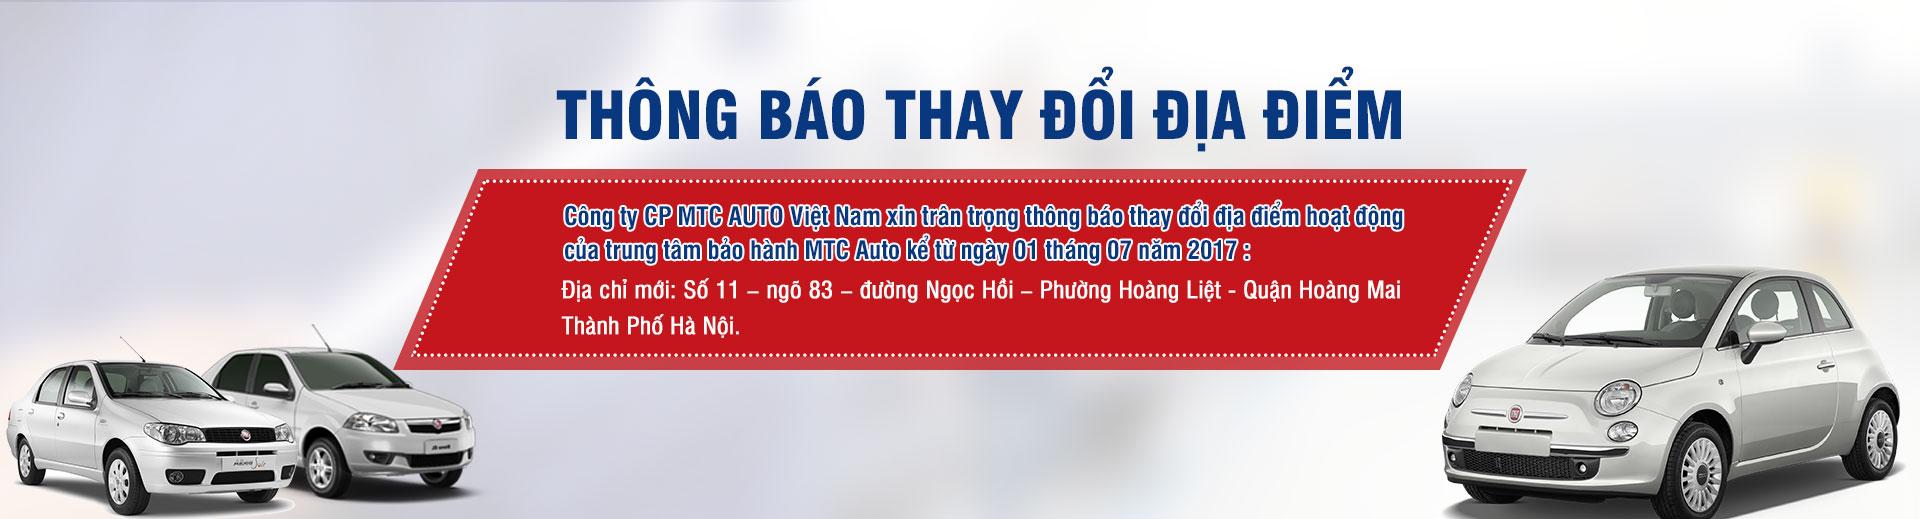 banner-web–thong-bao